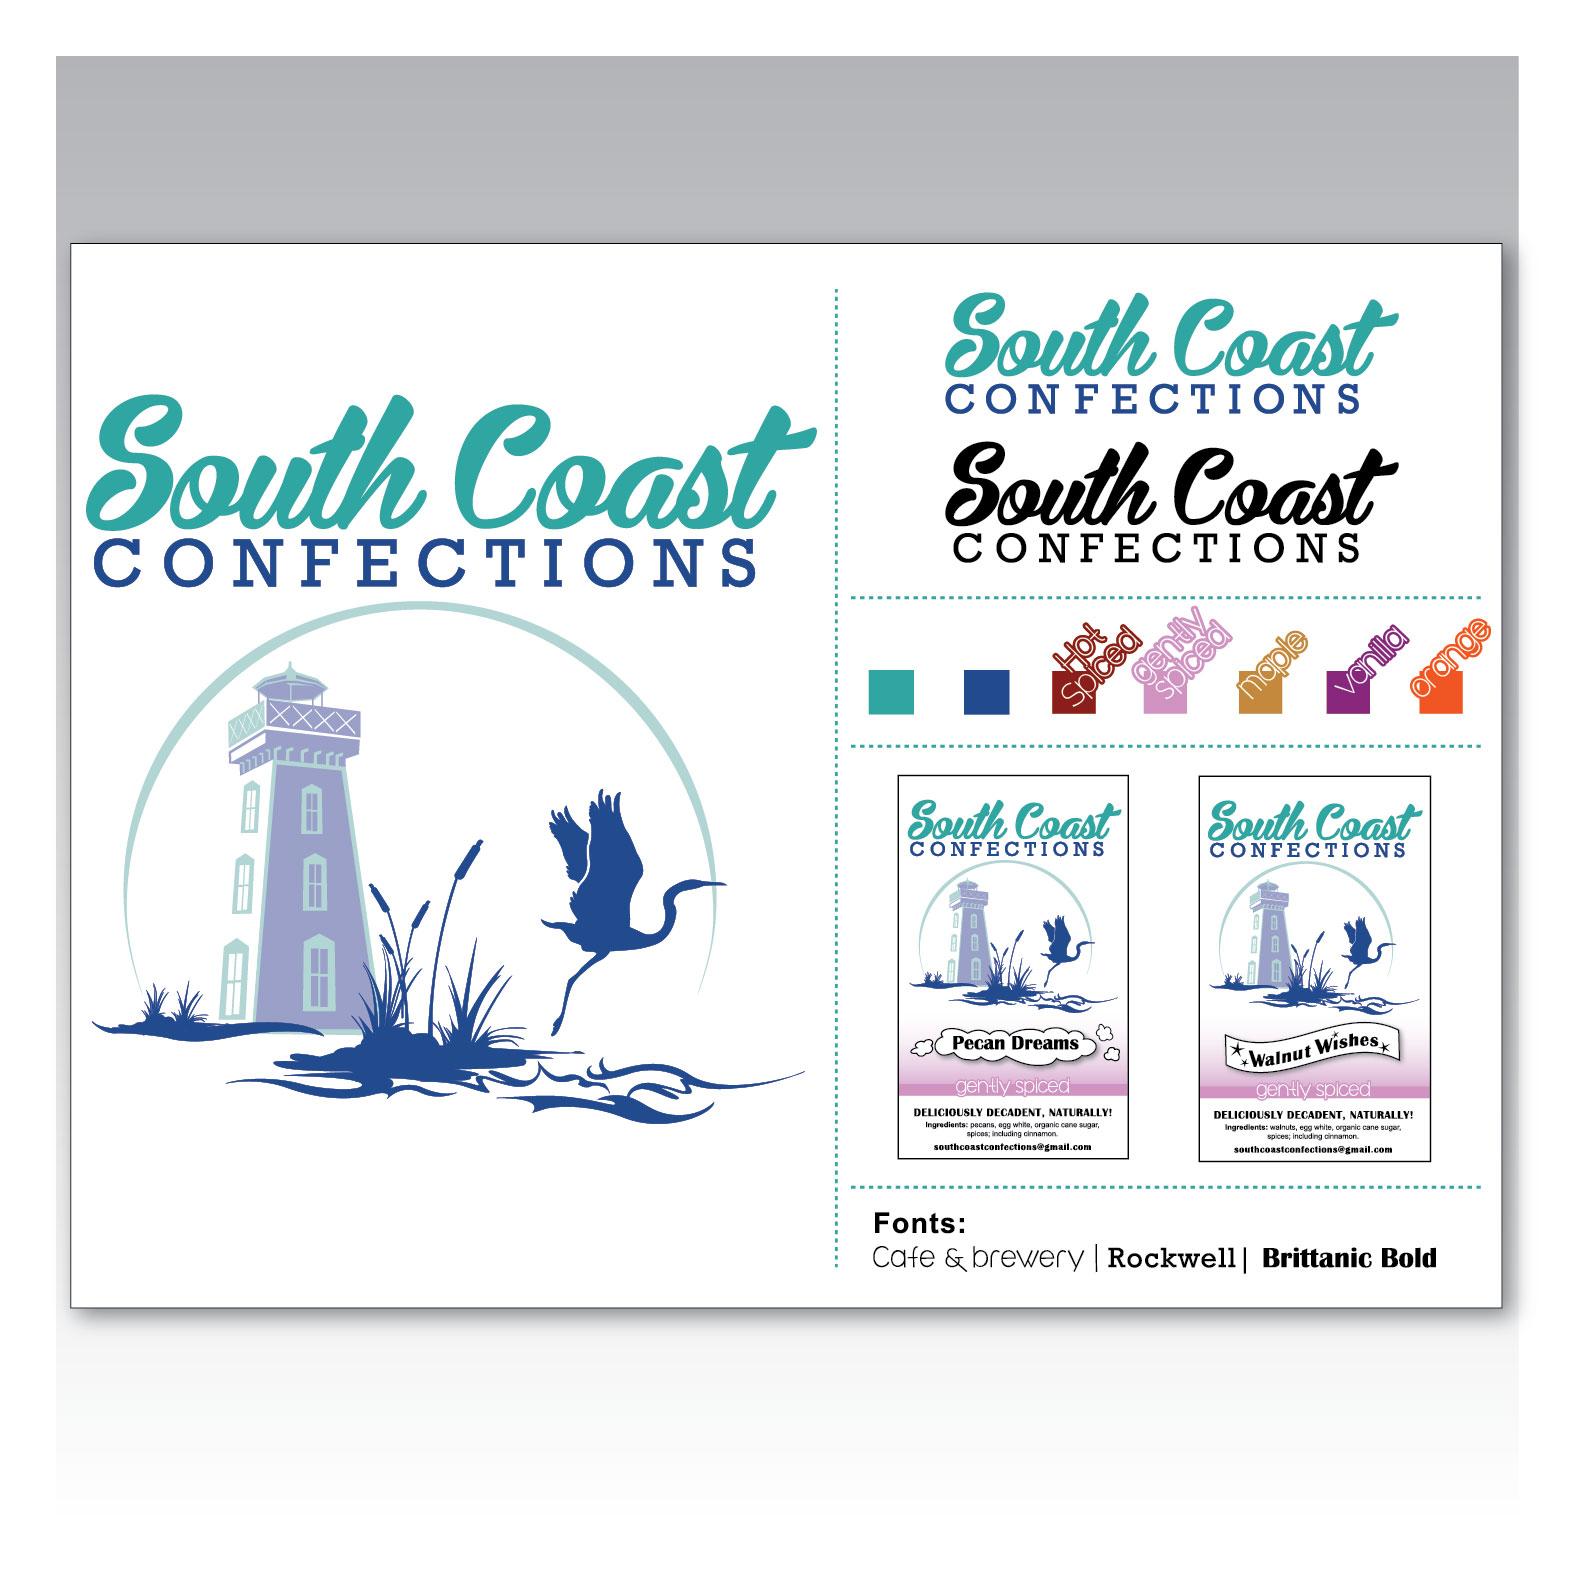 southcoast4-01.jpg